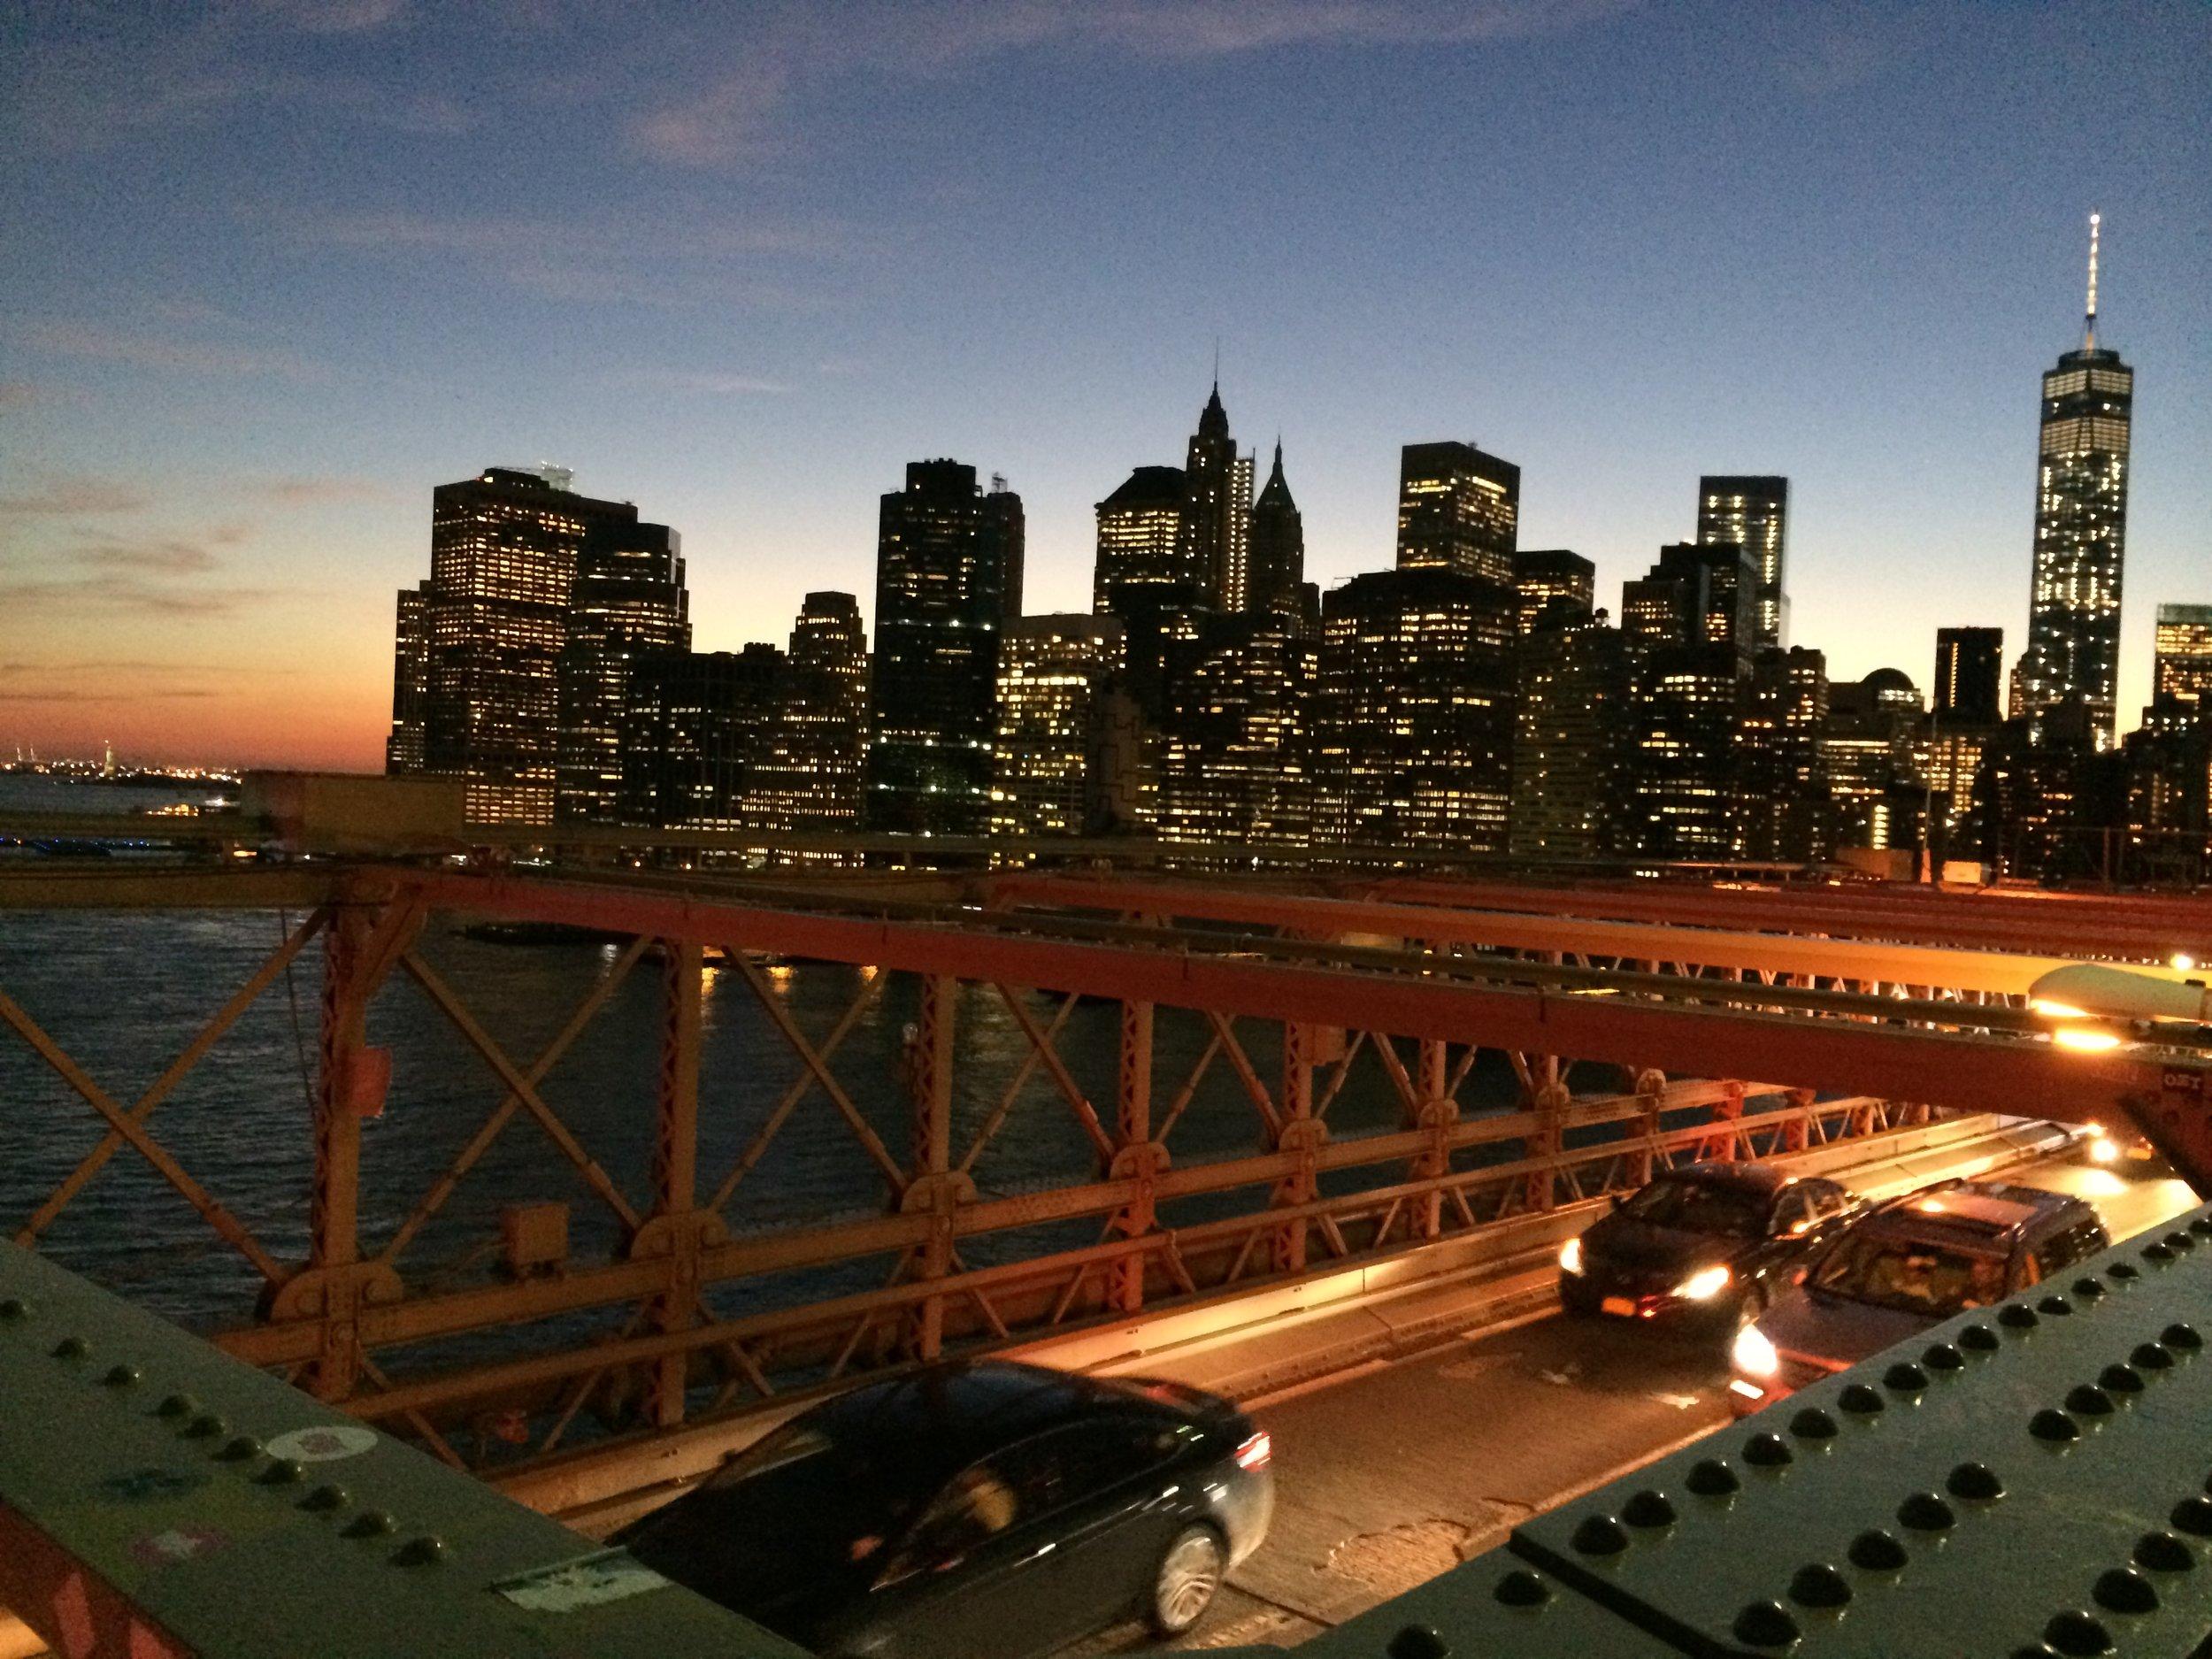 Brooklyn Bridge at night!!! Gorgeous!